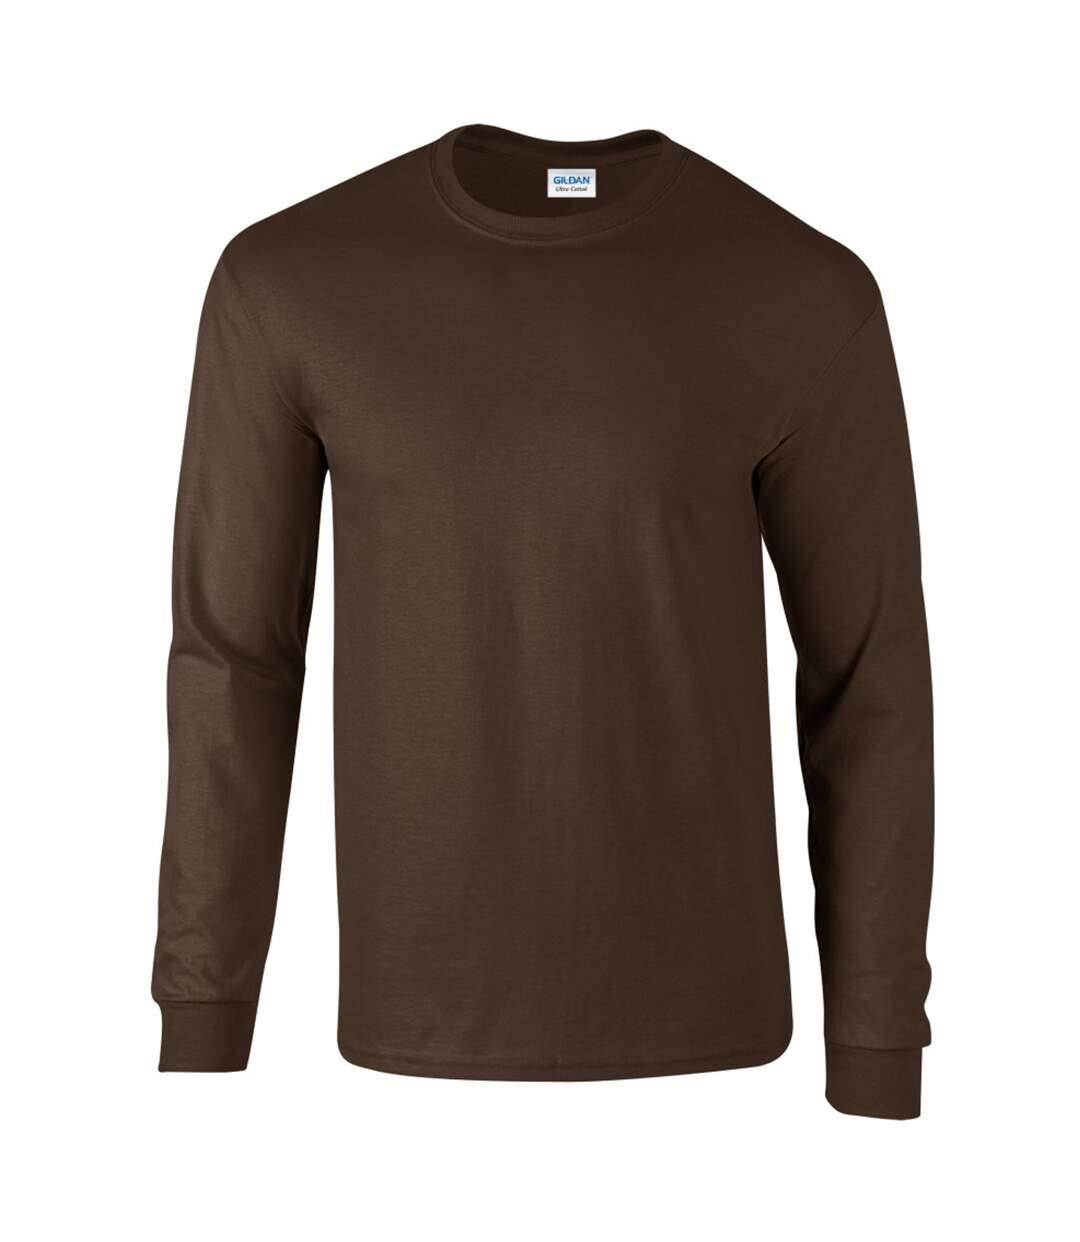 Gildan Mens Plain Crew Neck Ultra Cotton Long Sleeve T-Shirt (Dark Chocolate) - UTBC477